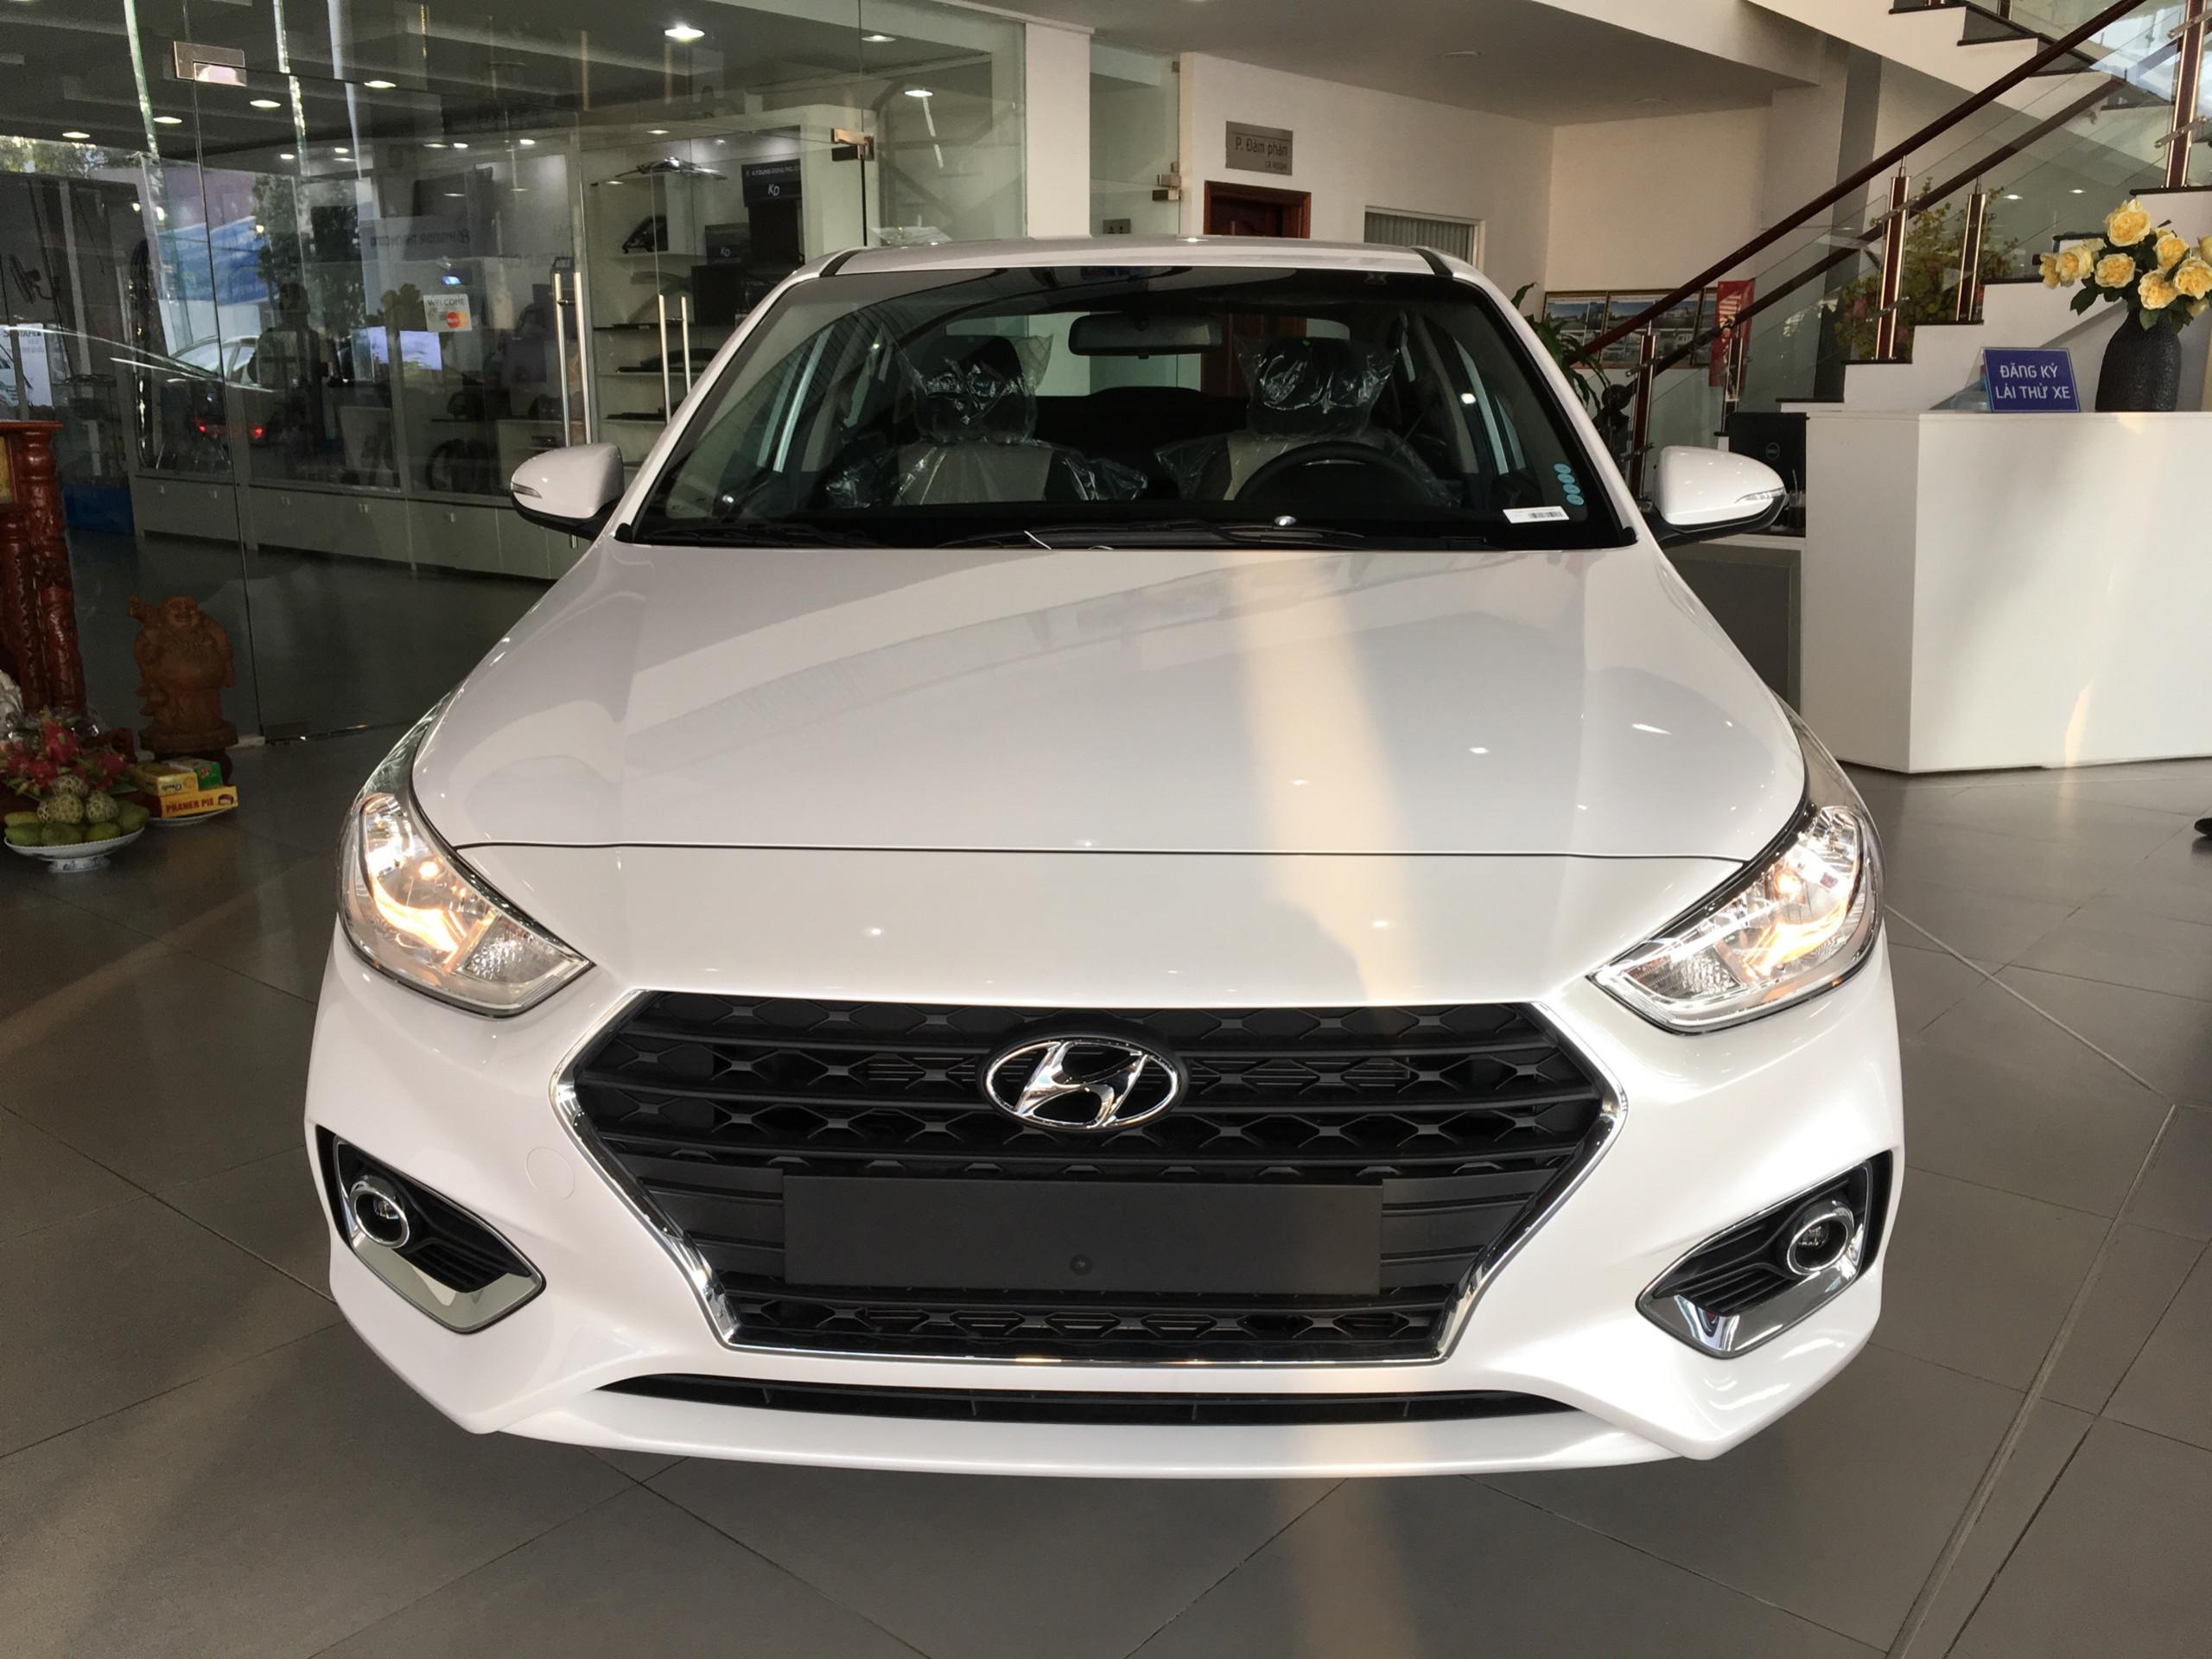 Hyundai Accent 1.4MT Bản Nâng Cấp 2019